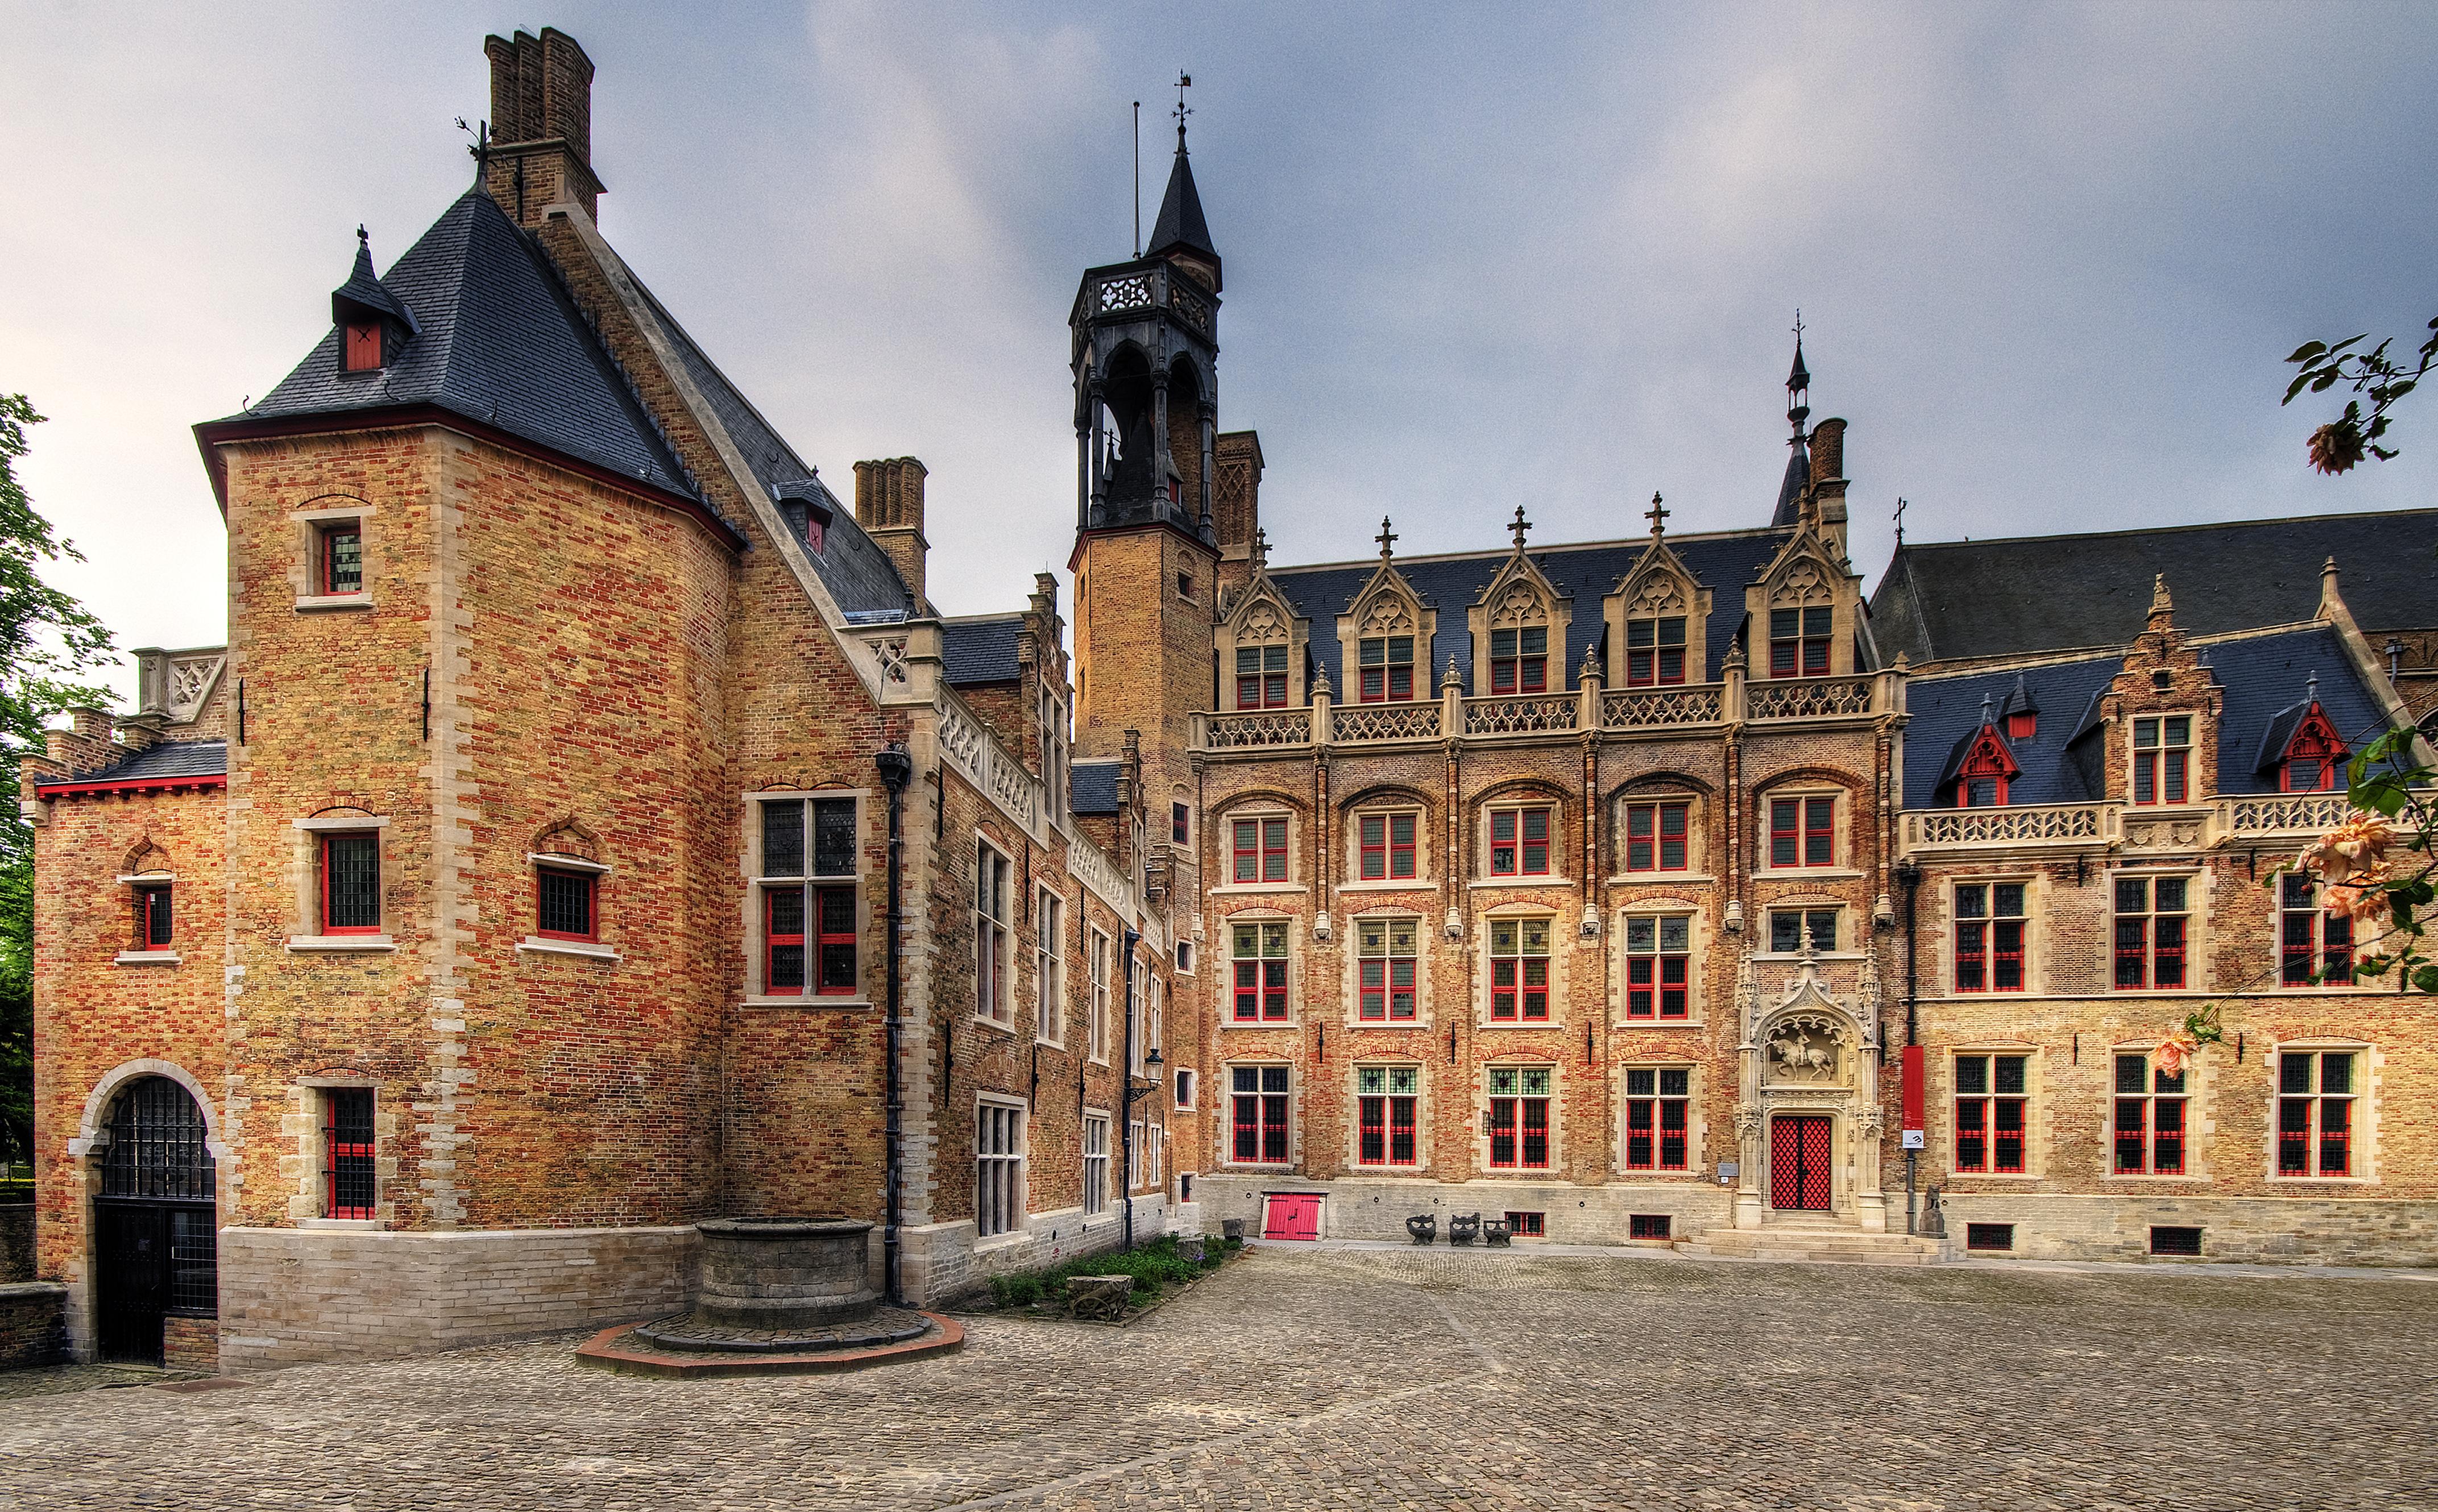 Gruuthuuse_Museum%2C_Bruges.jpg